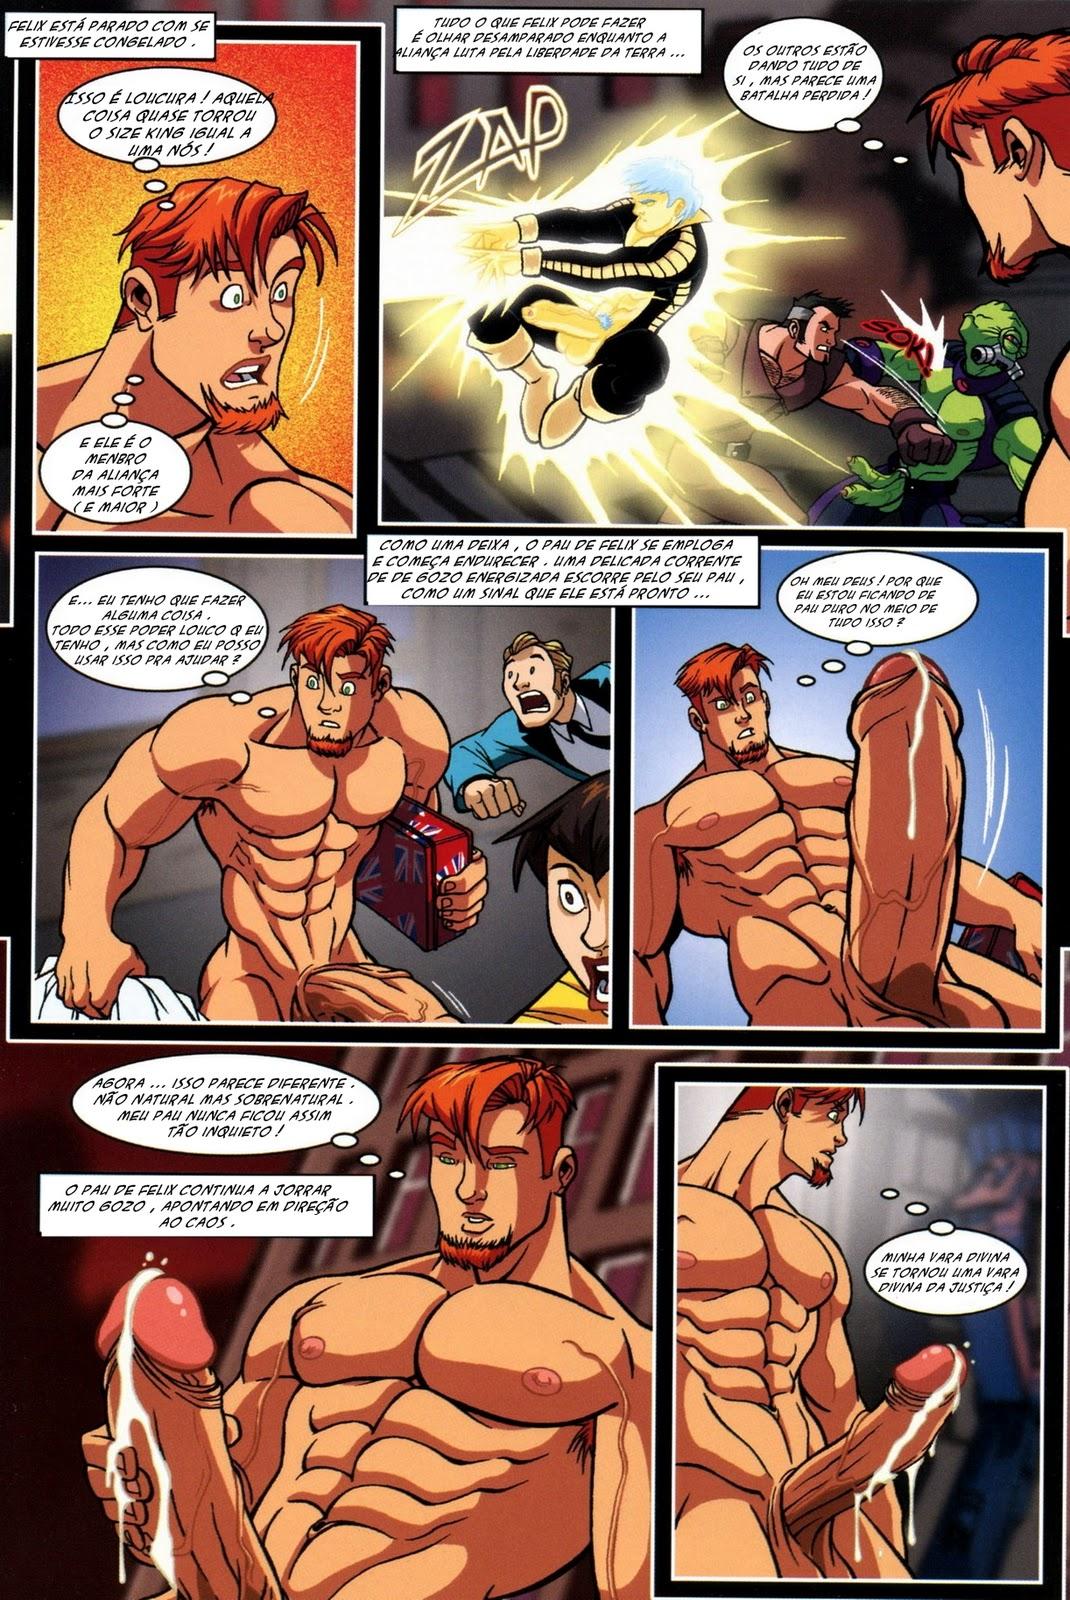 zdarma gay sex komiks